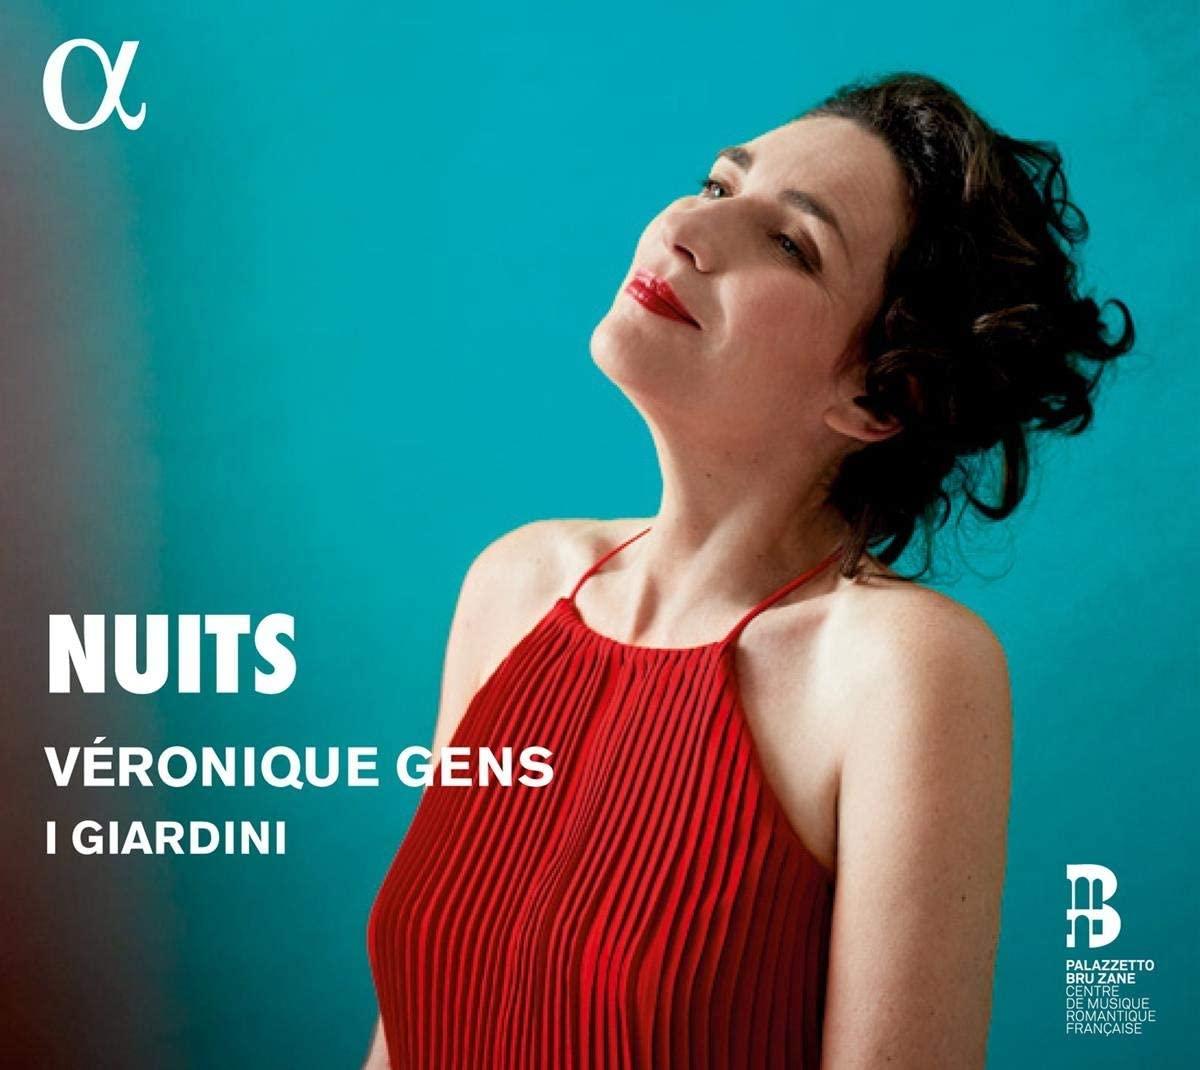 Review of Véronique Gens: Nuits